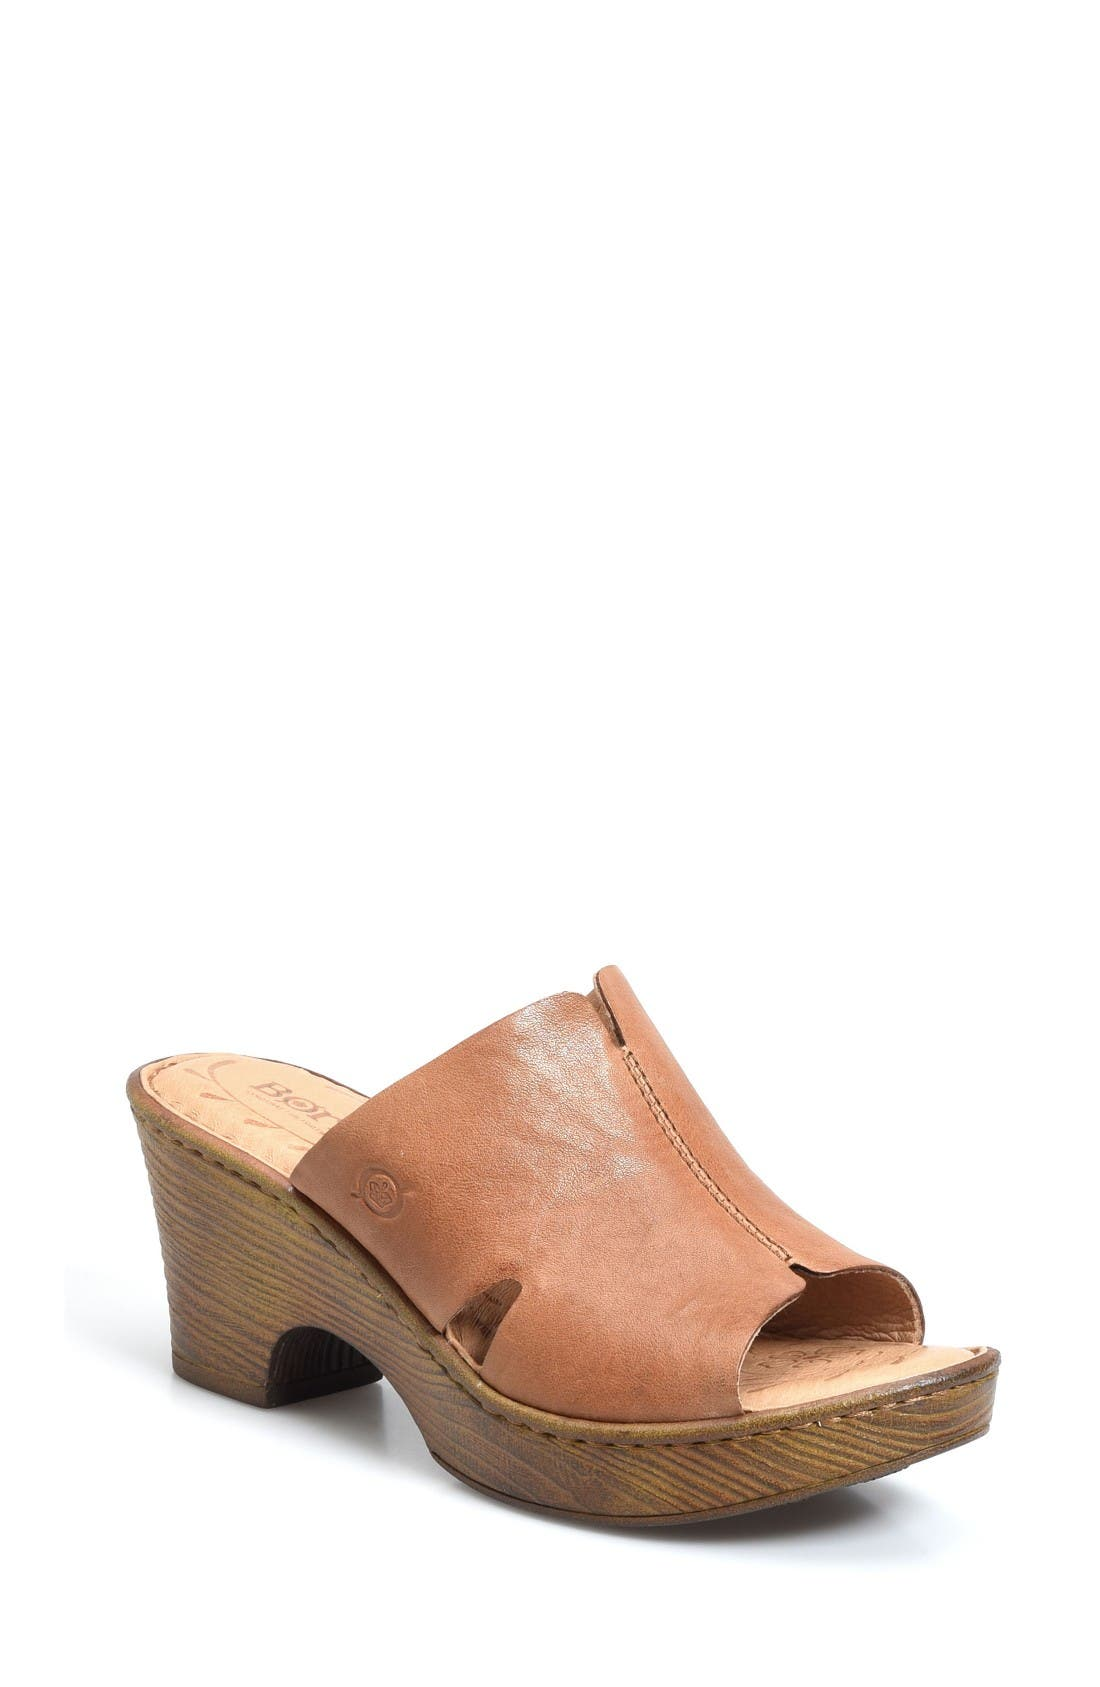 Crato Mule,                         Main,                         color, Brown Leather